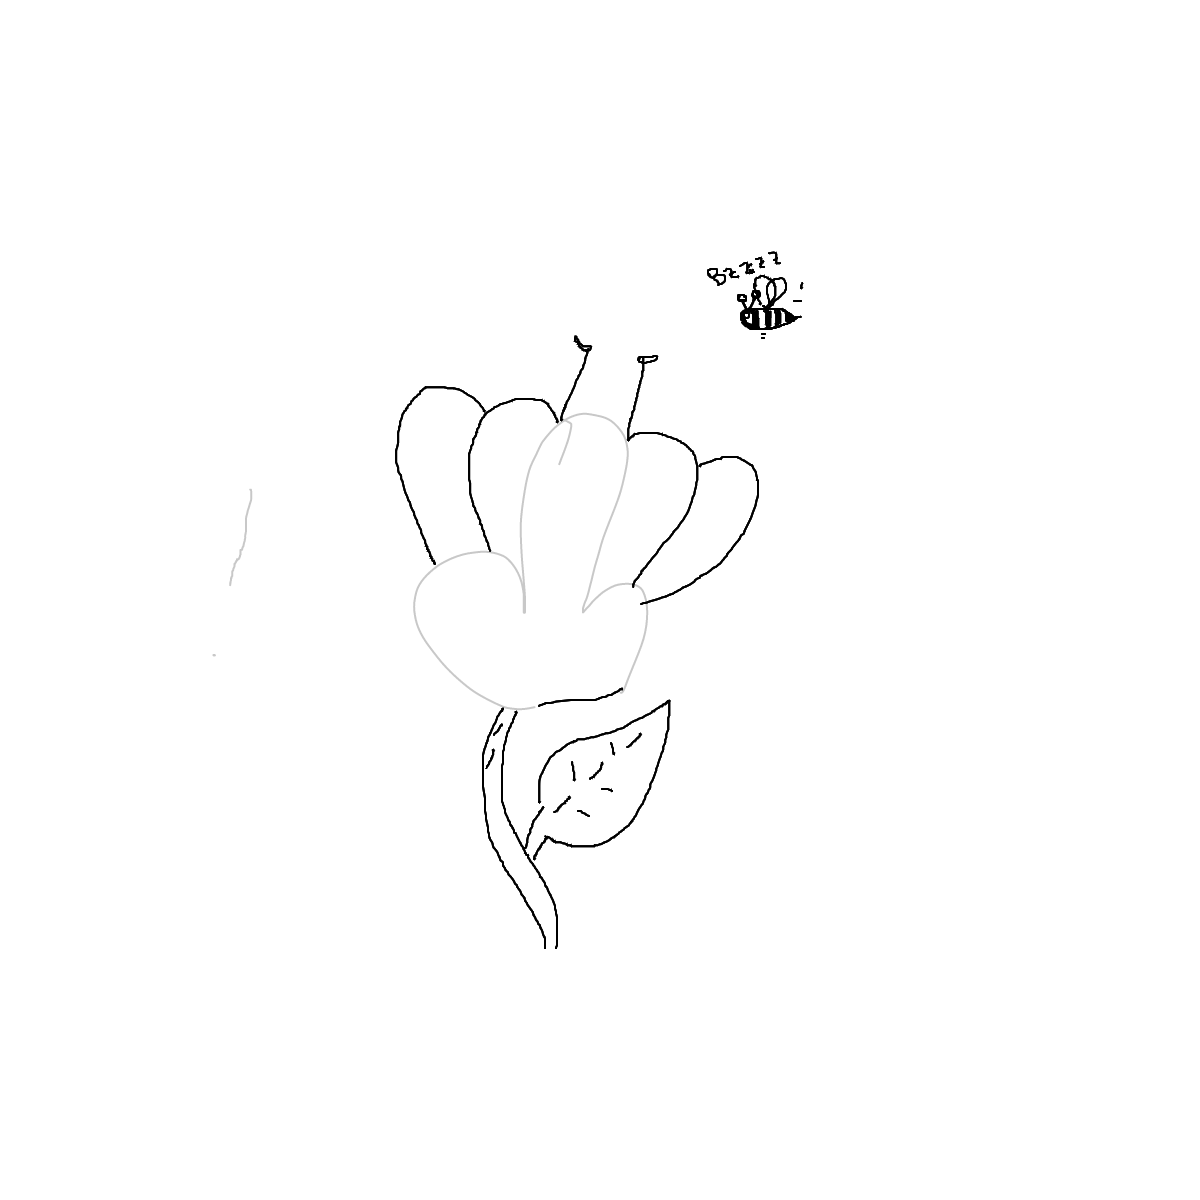 BAAAM drawing#5095 lat:-41.4425582885742200lng: 147.1378021240234400